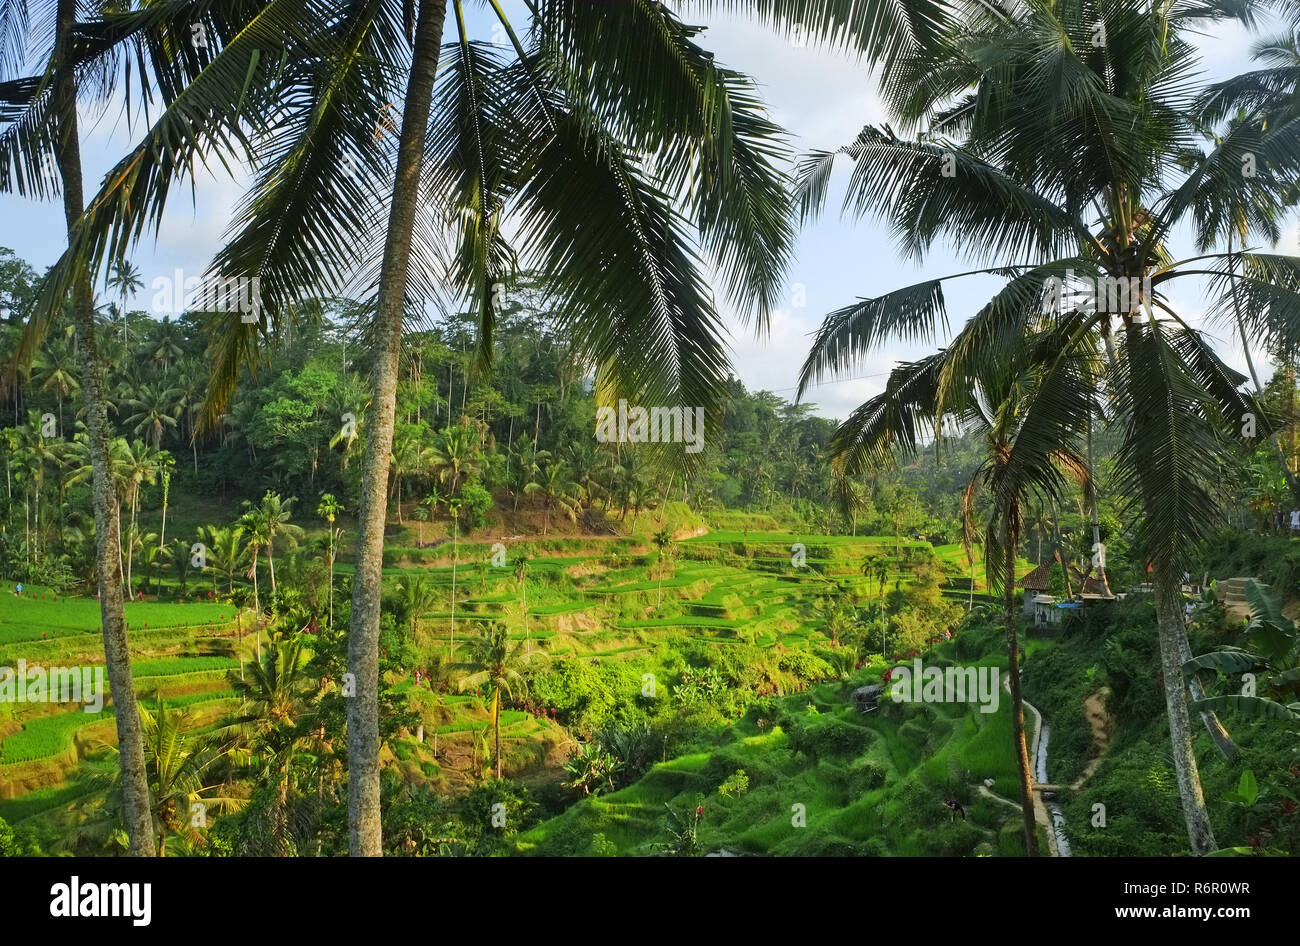 Tegallalang rice terrace - Stock Image